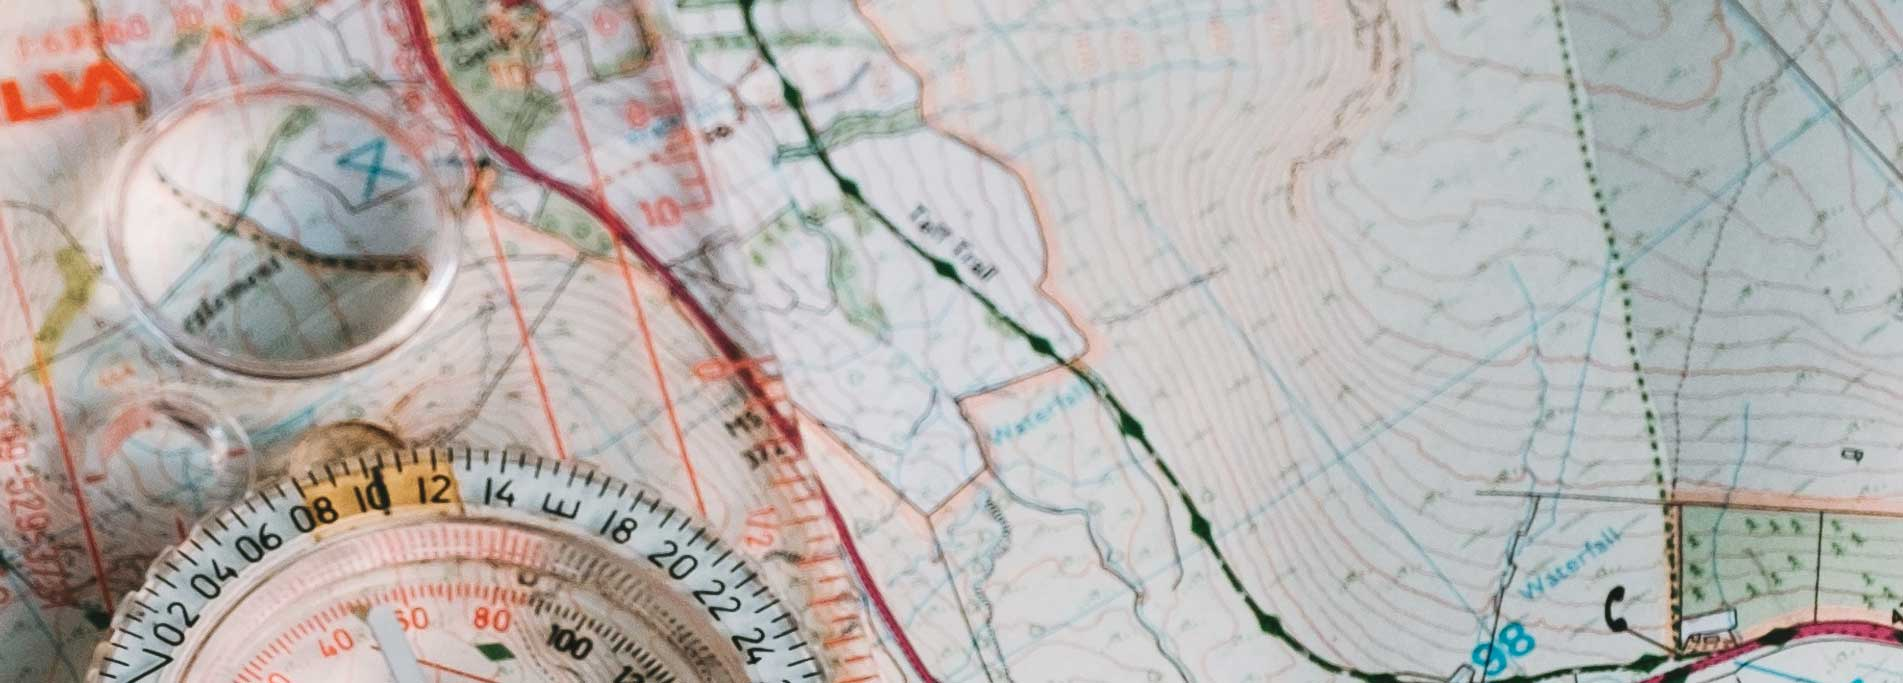 Corso di cartografia e nordic walking al Panperduto